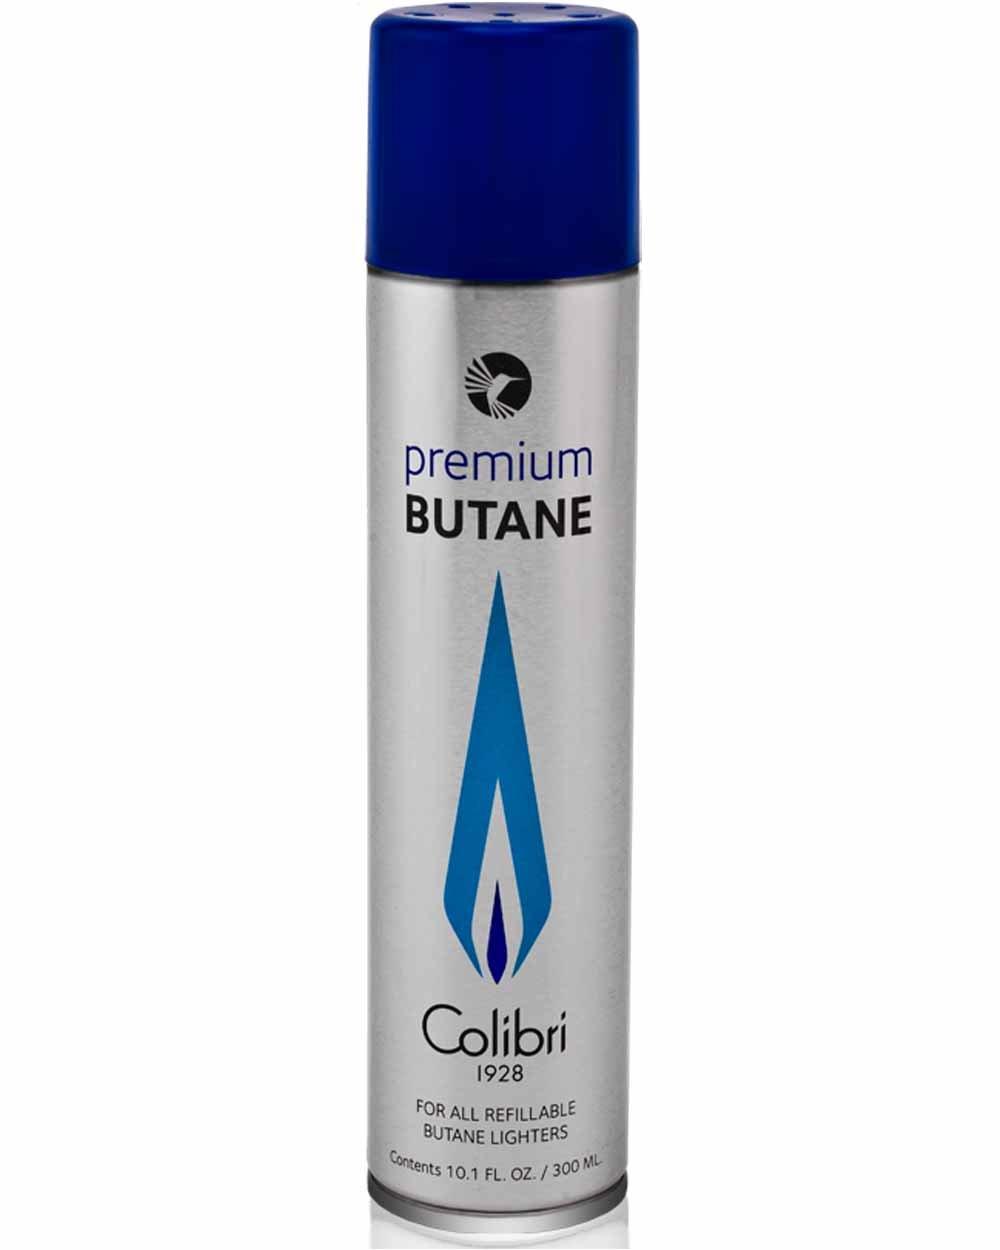 1144c9d5a475 Colibri 300ml 10.1 Fluid Ounce Premium Butane Fuel Gas Refill